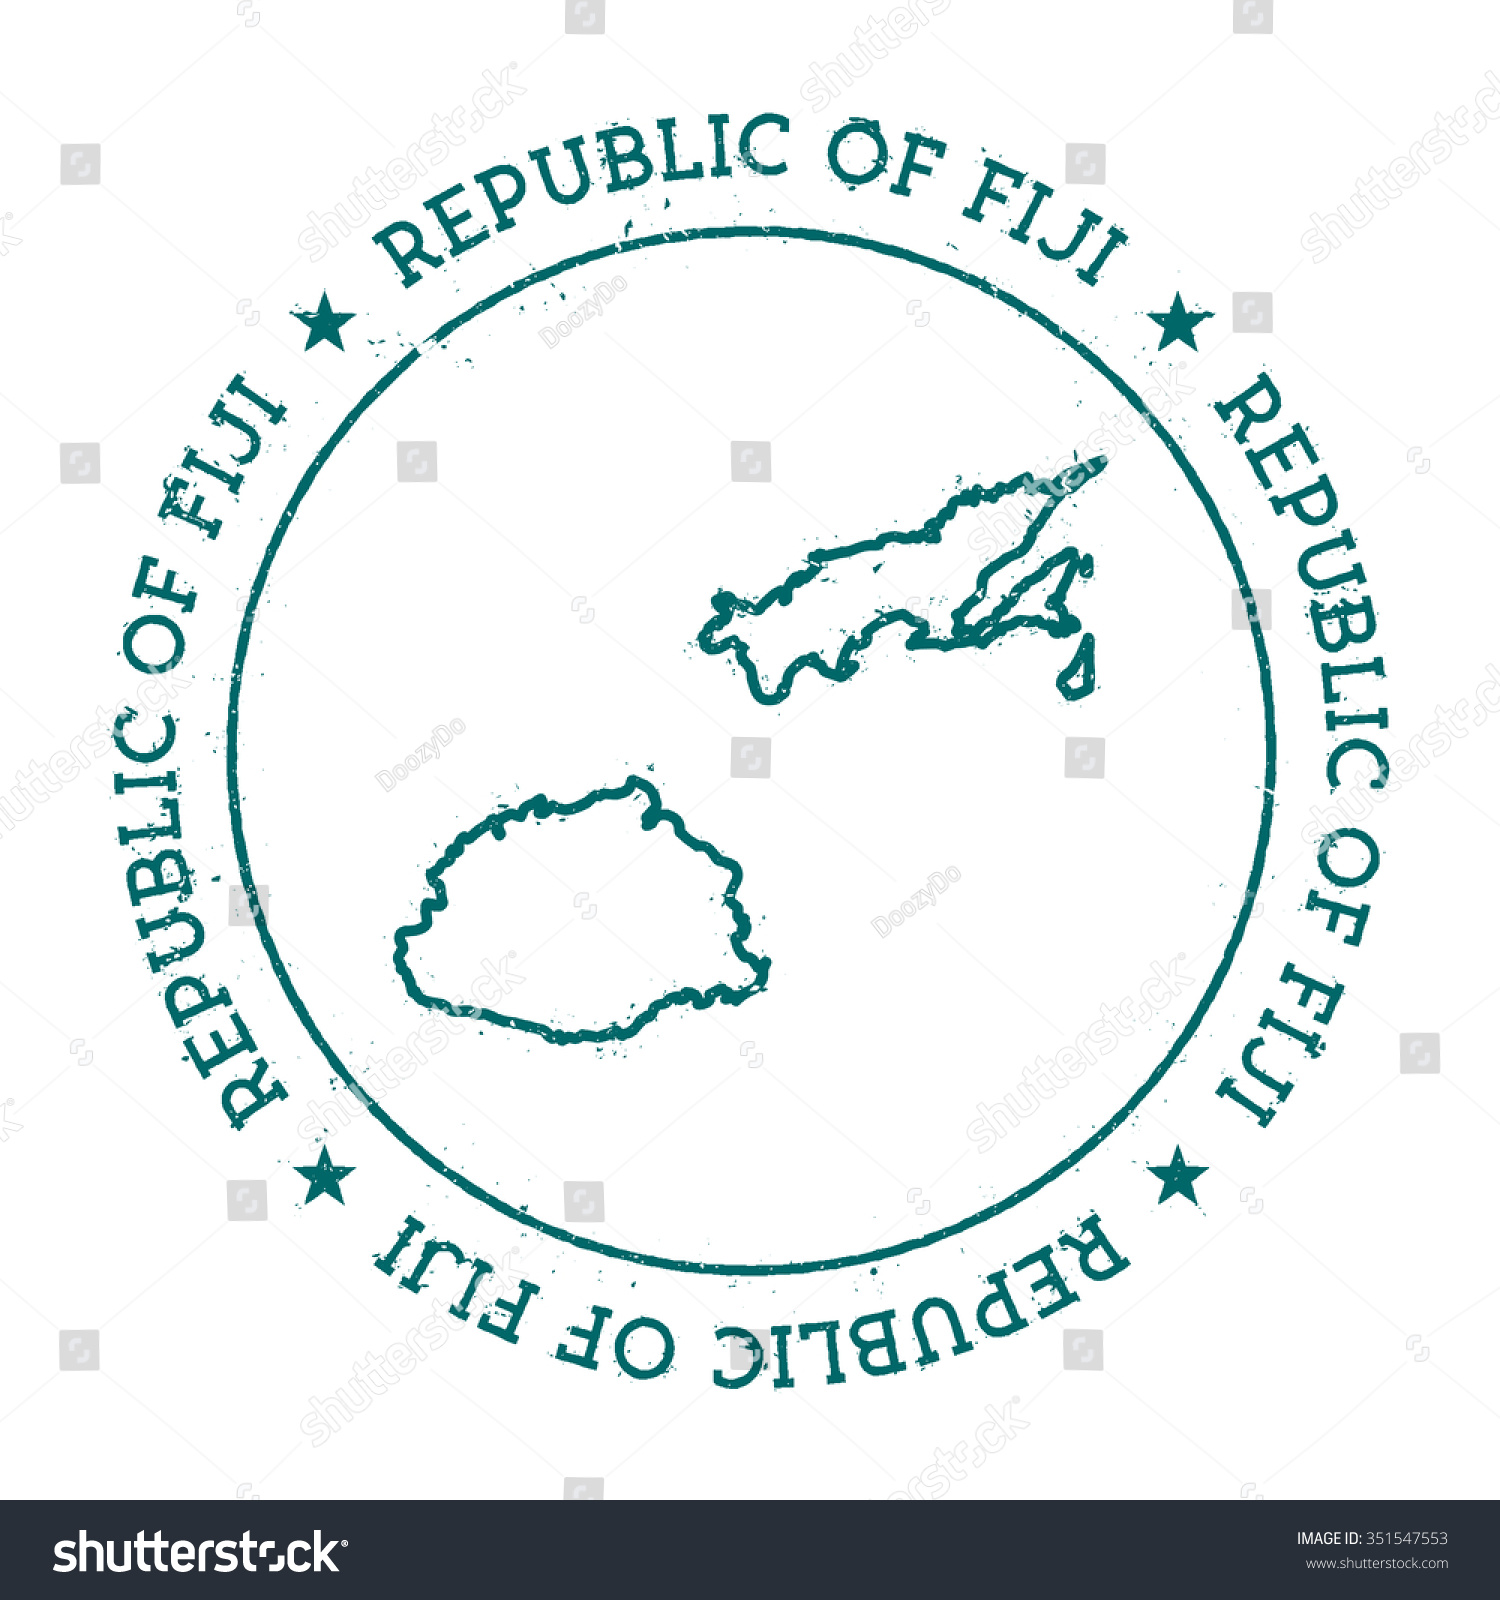 Retro Vintage Insignia Fiji Map Distressed Stock Vector - Republic of fiji map